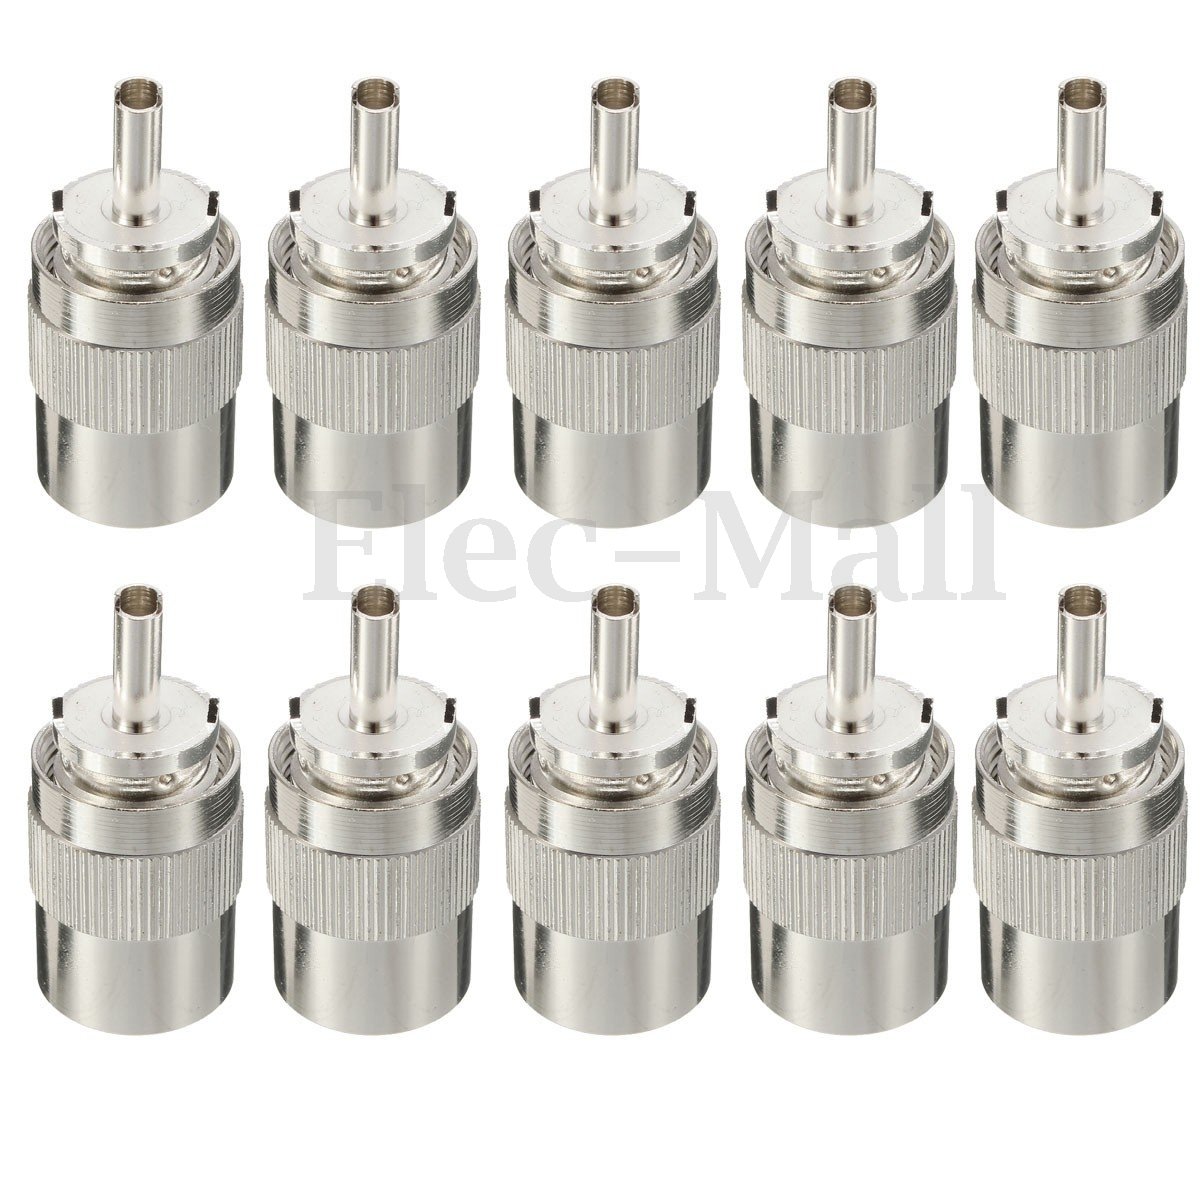 10pcs Connector UHF male PL259 plug solder RG8 RG213 LMR400 7D-FB cable silver разъемы и переходники dynavox plug rg 01 gold